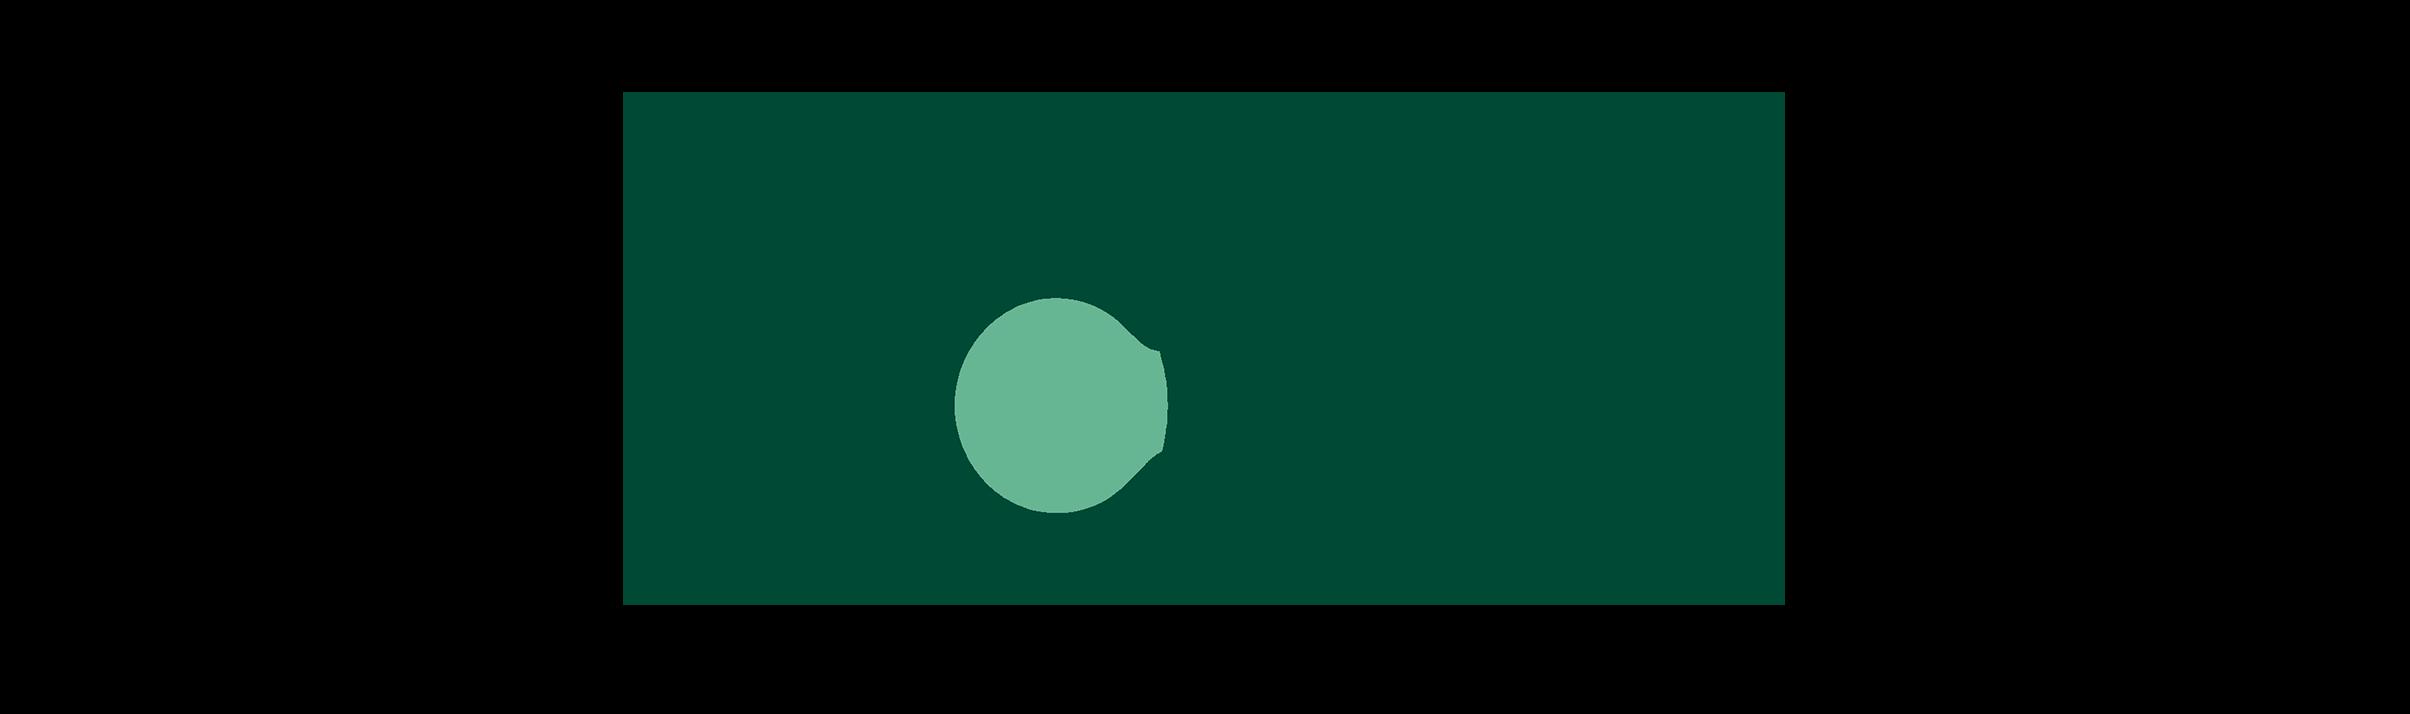 GG-Univers-Logo-1